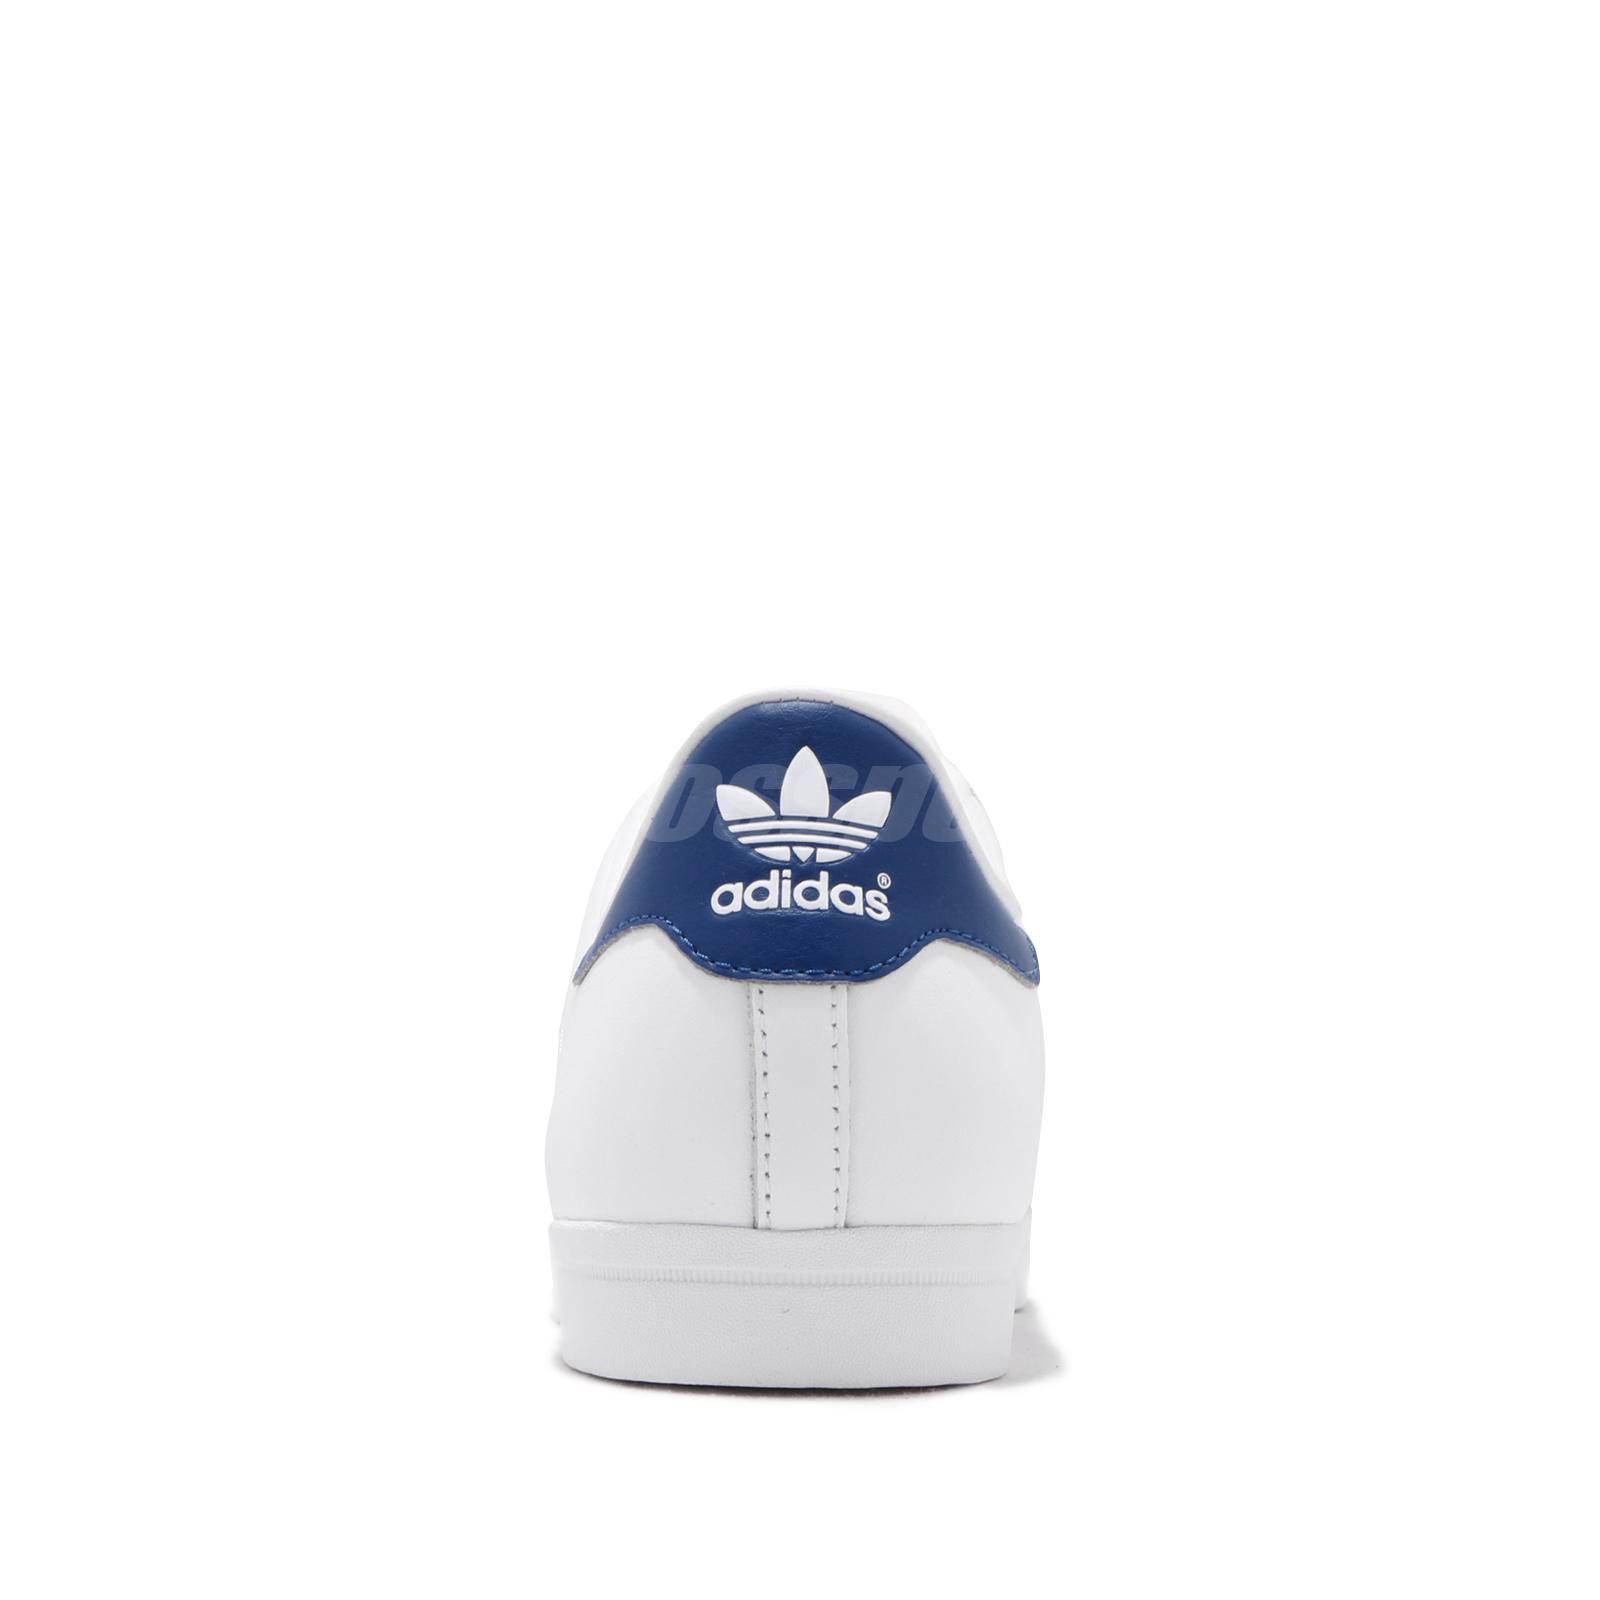 adidas Originals Coast Star White Navy